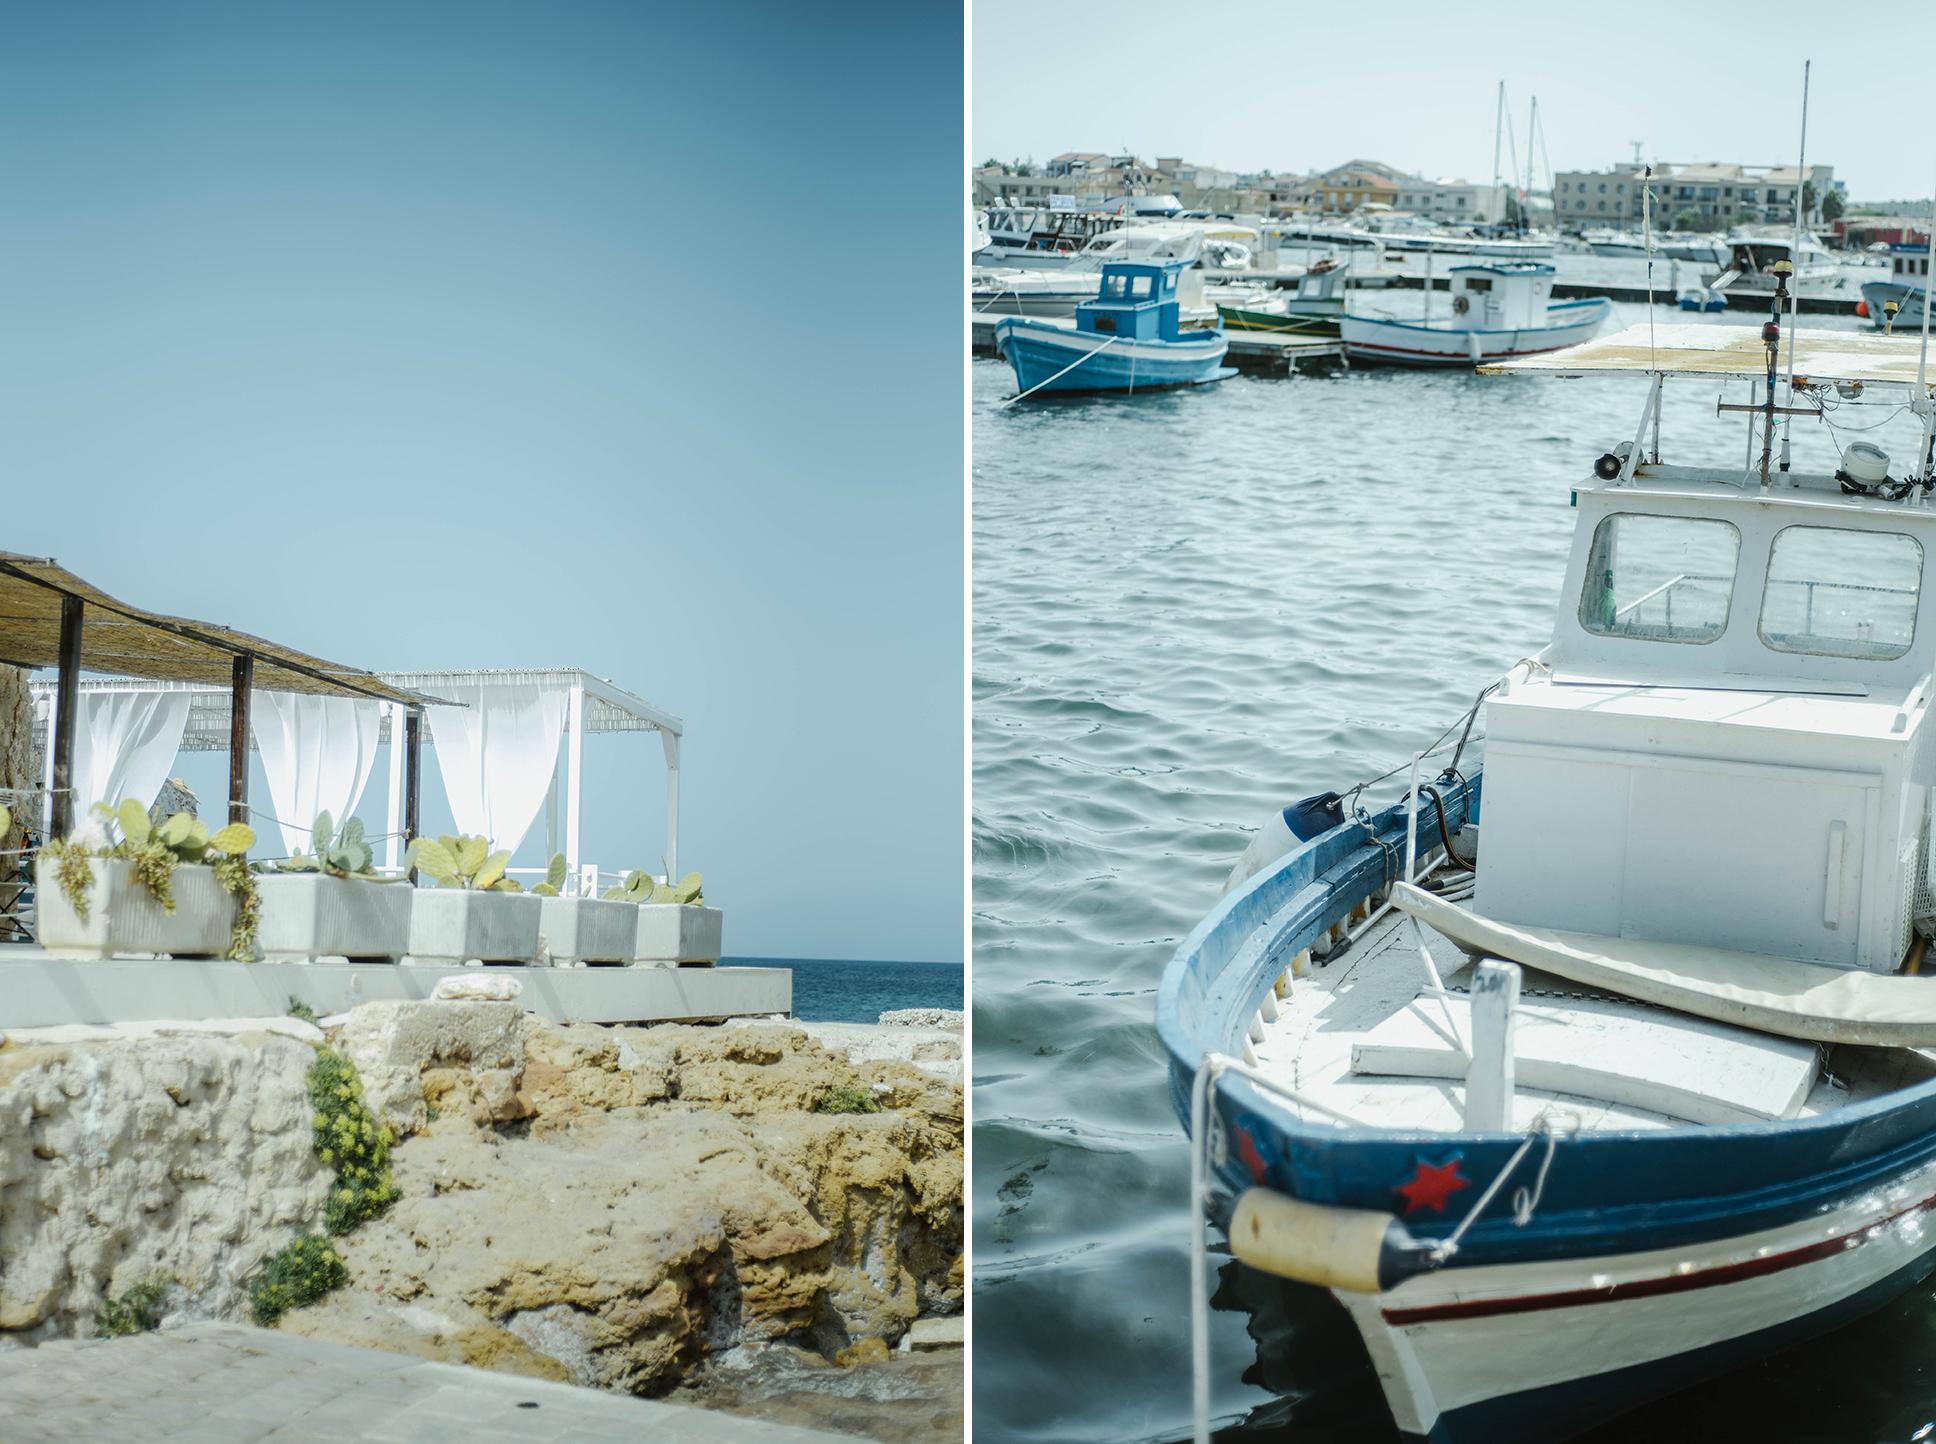 marzamemi_boats.jpg